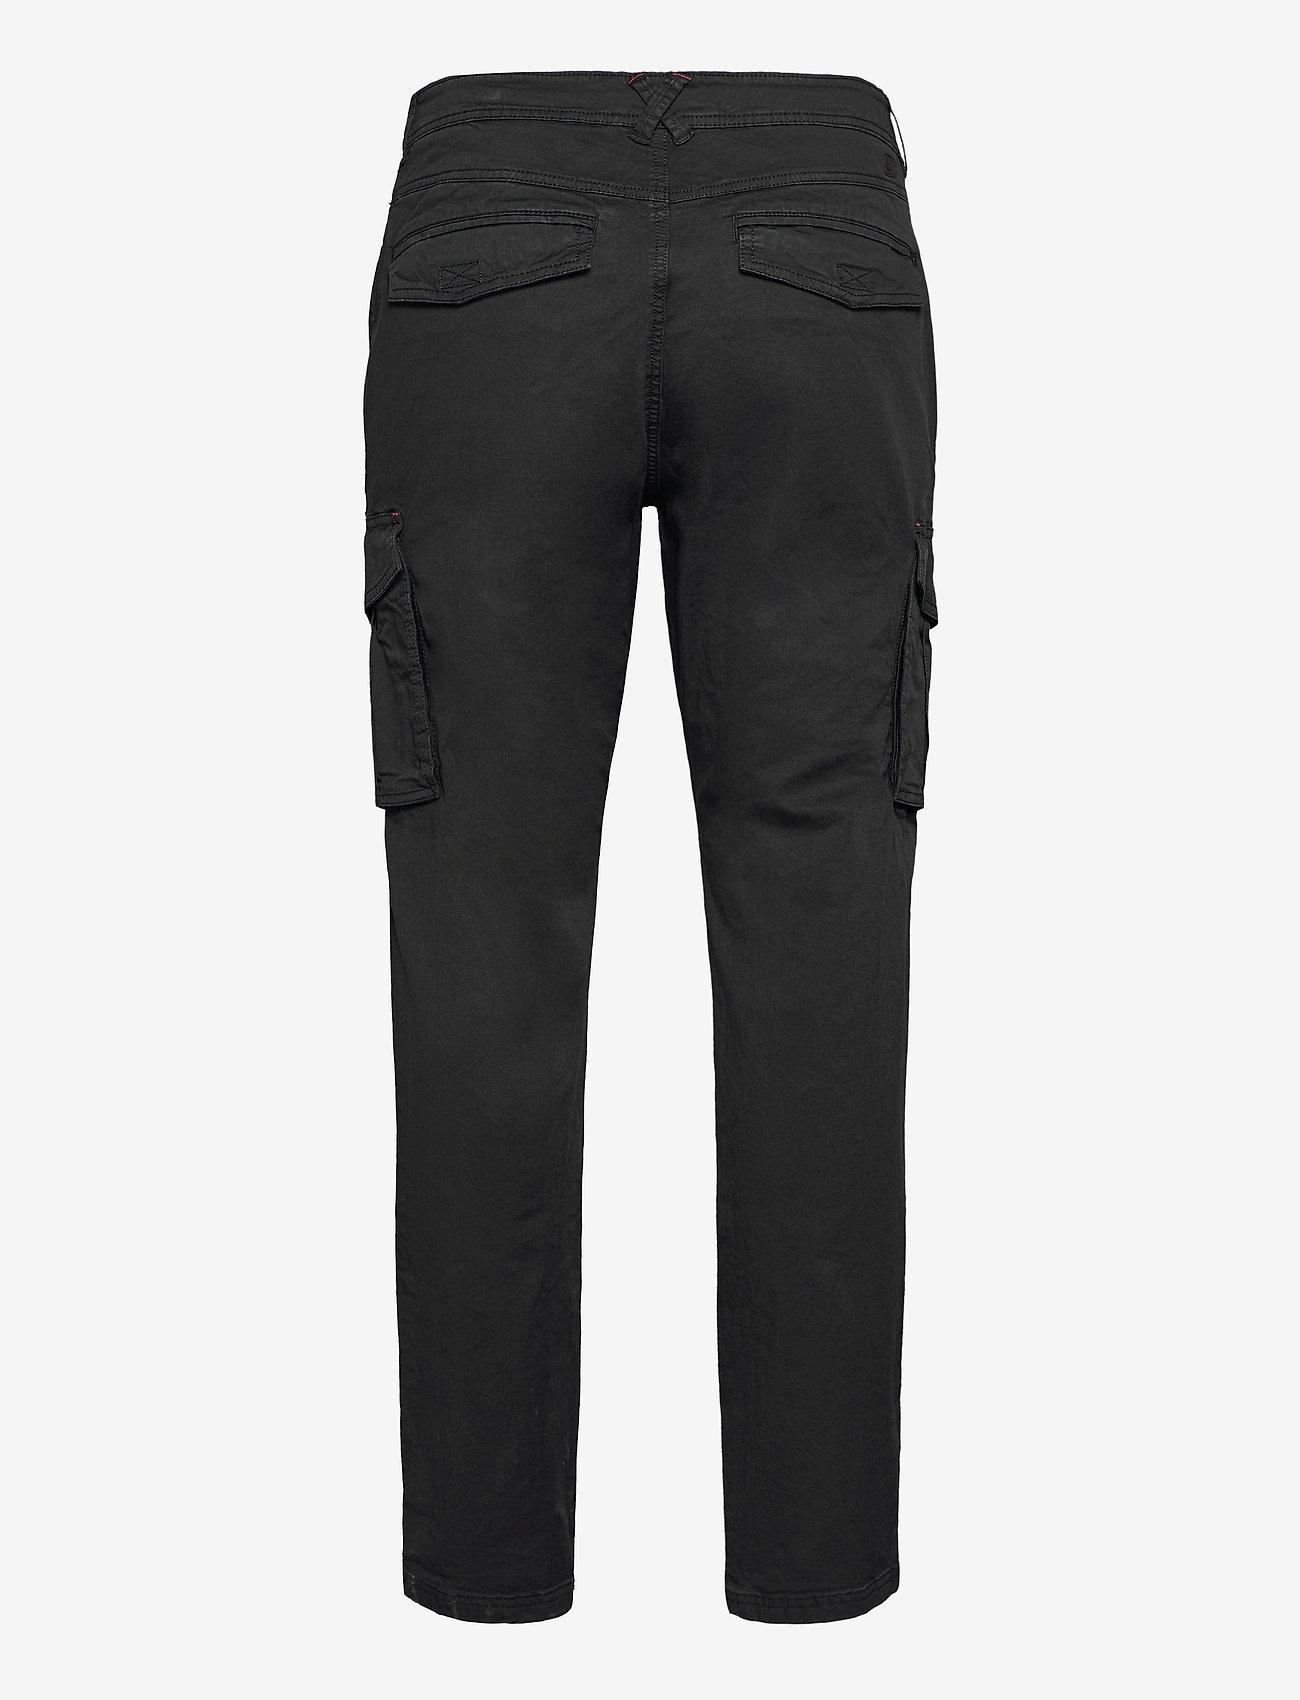 Blend - Pants - cargobukser - black - 1